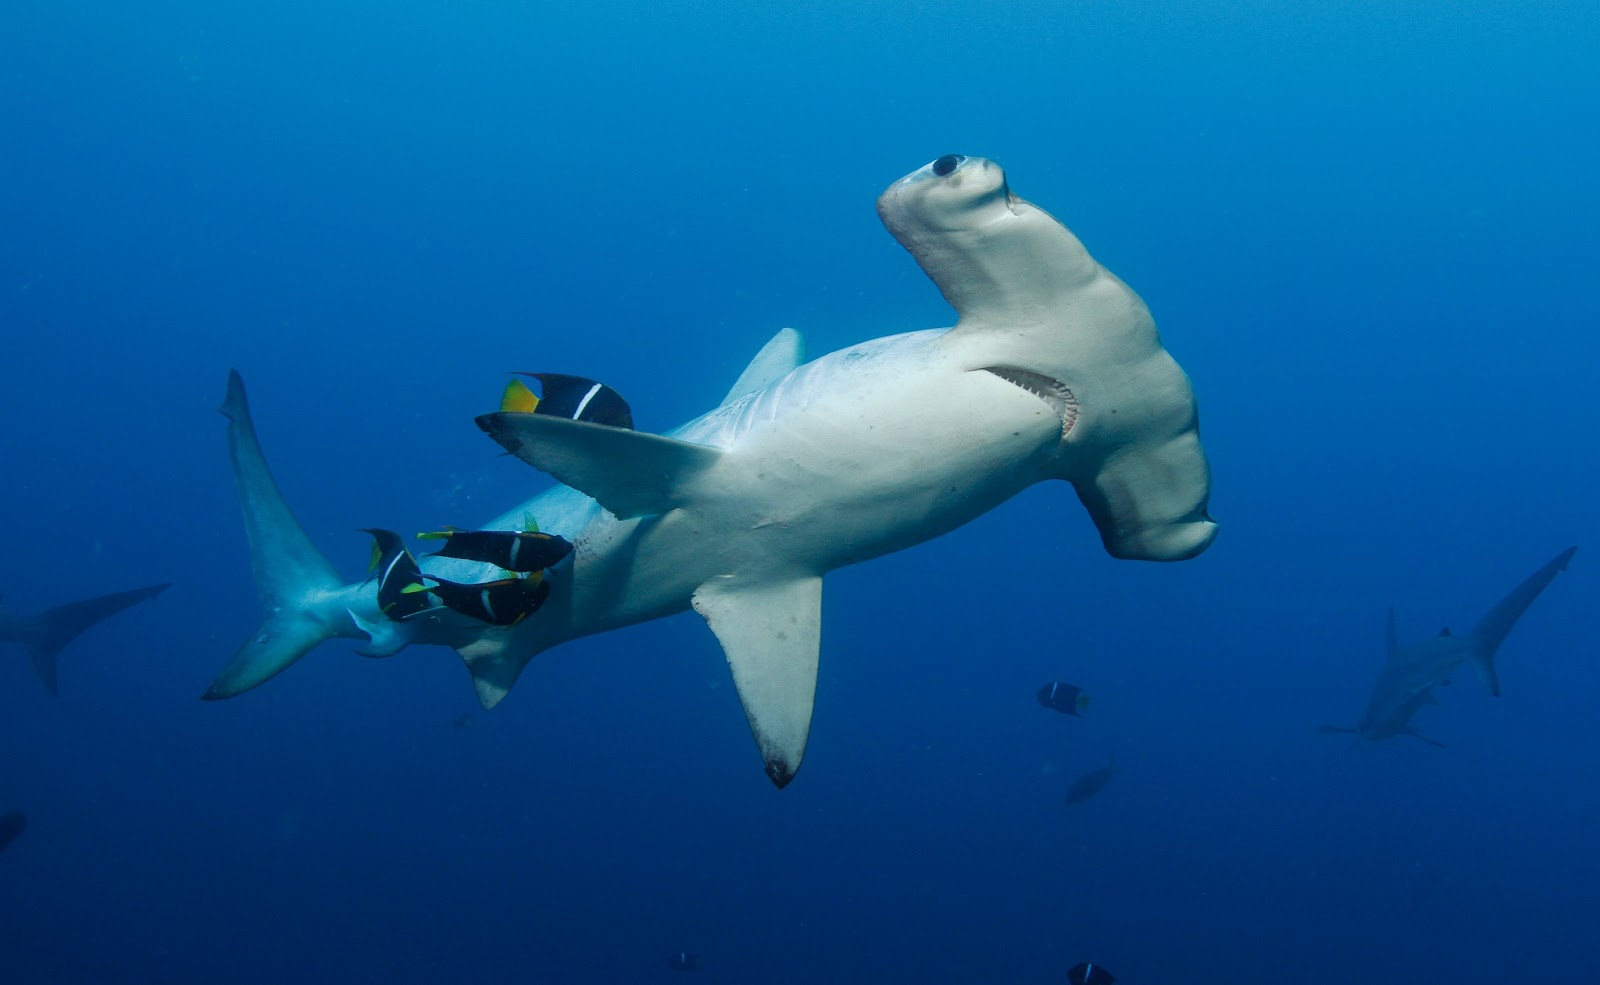 Biggest Hammerhead Shark Ever Caught